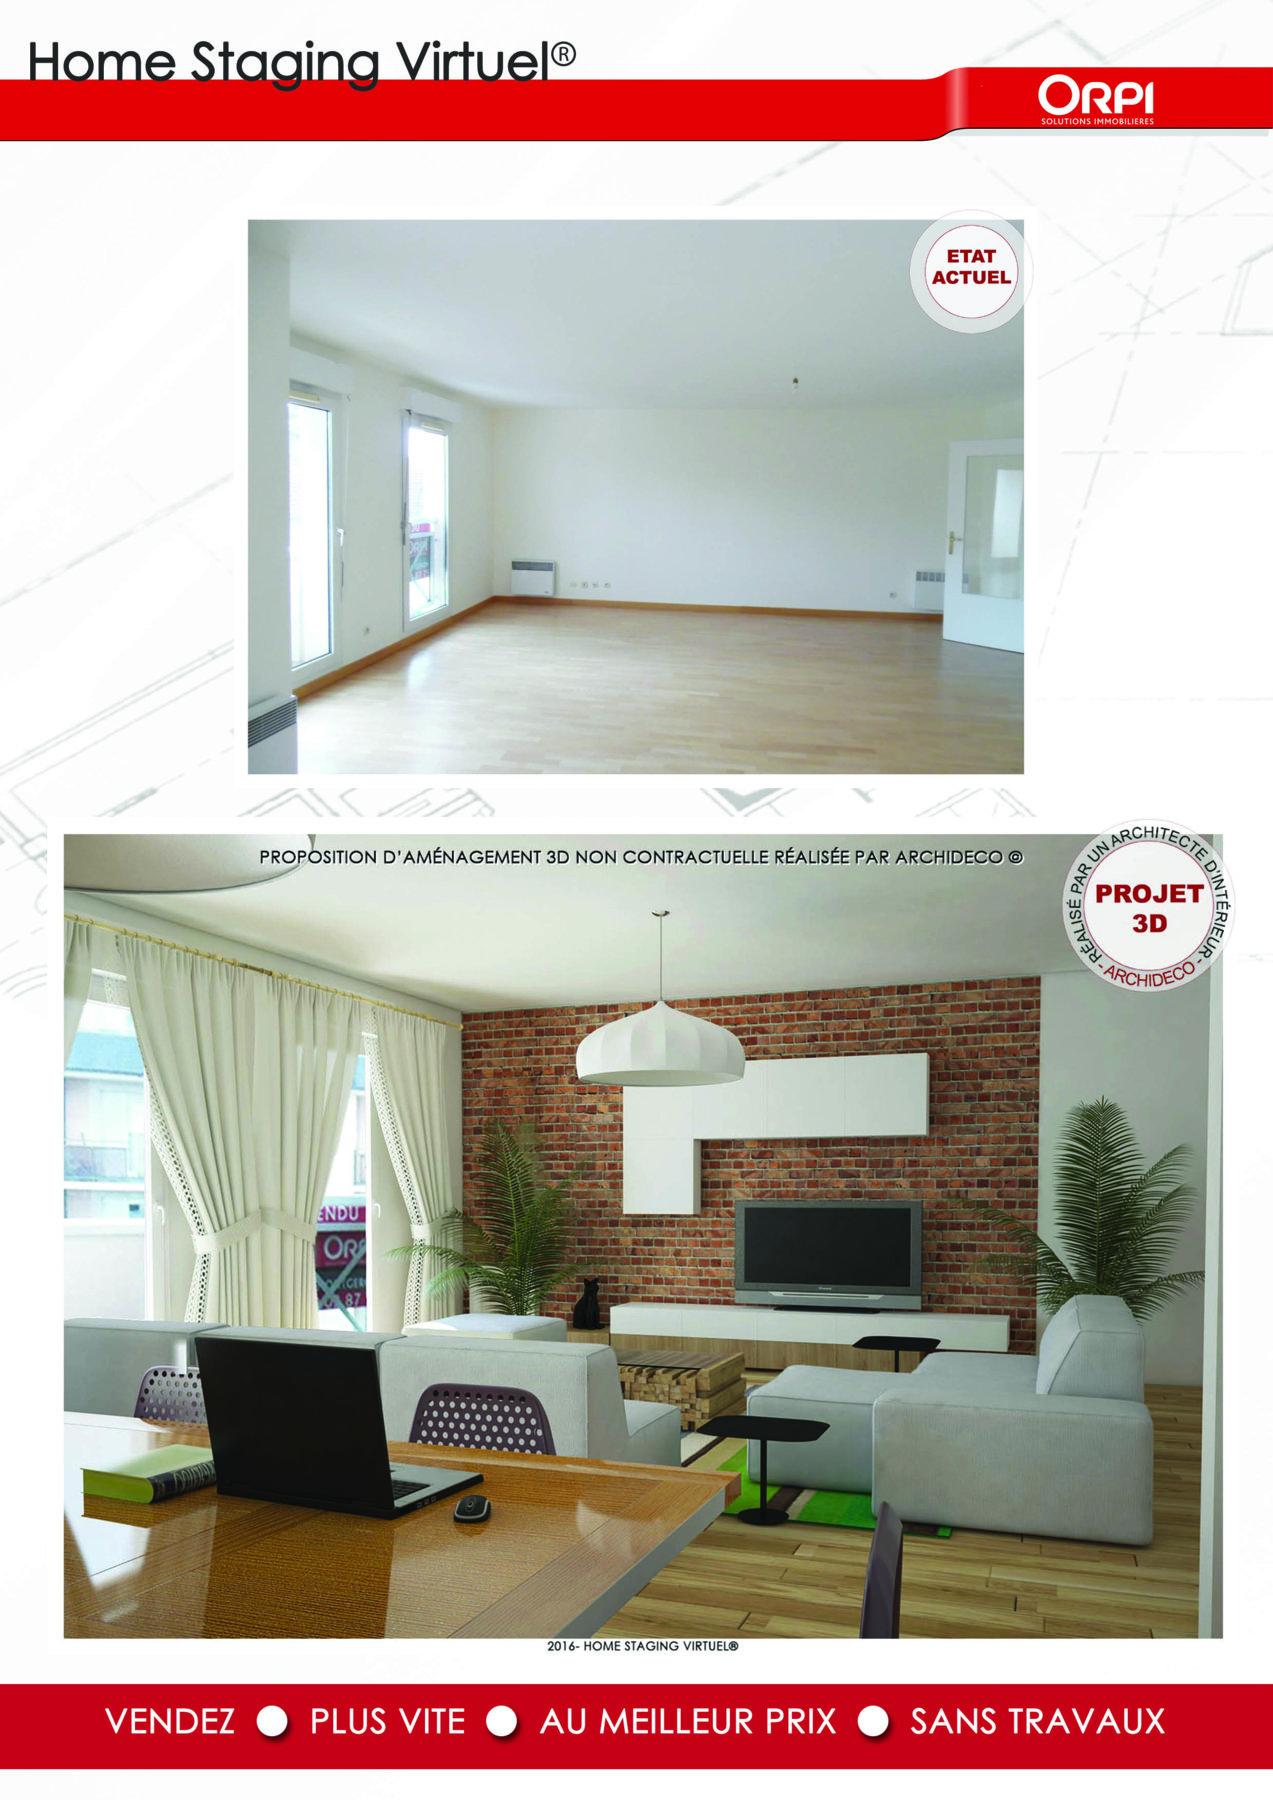 Agence Immobilière Home Staging nouveau* le home staging virtuel® arrive chez orpi